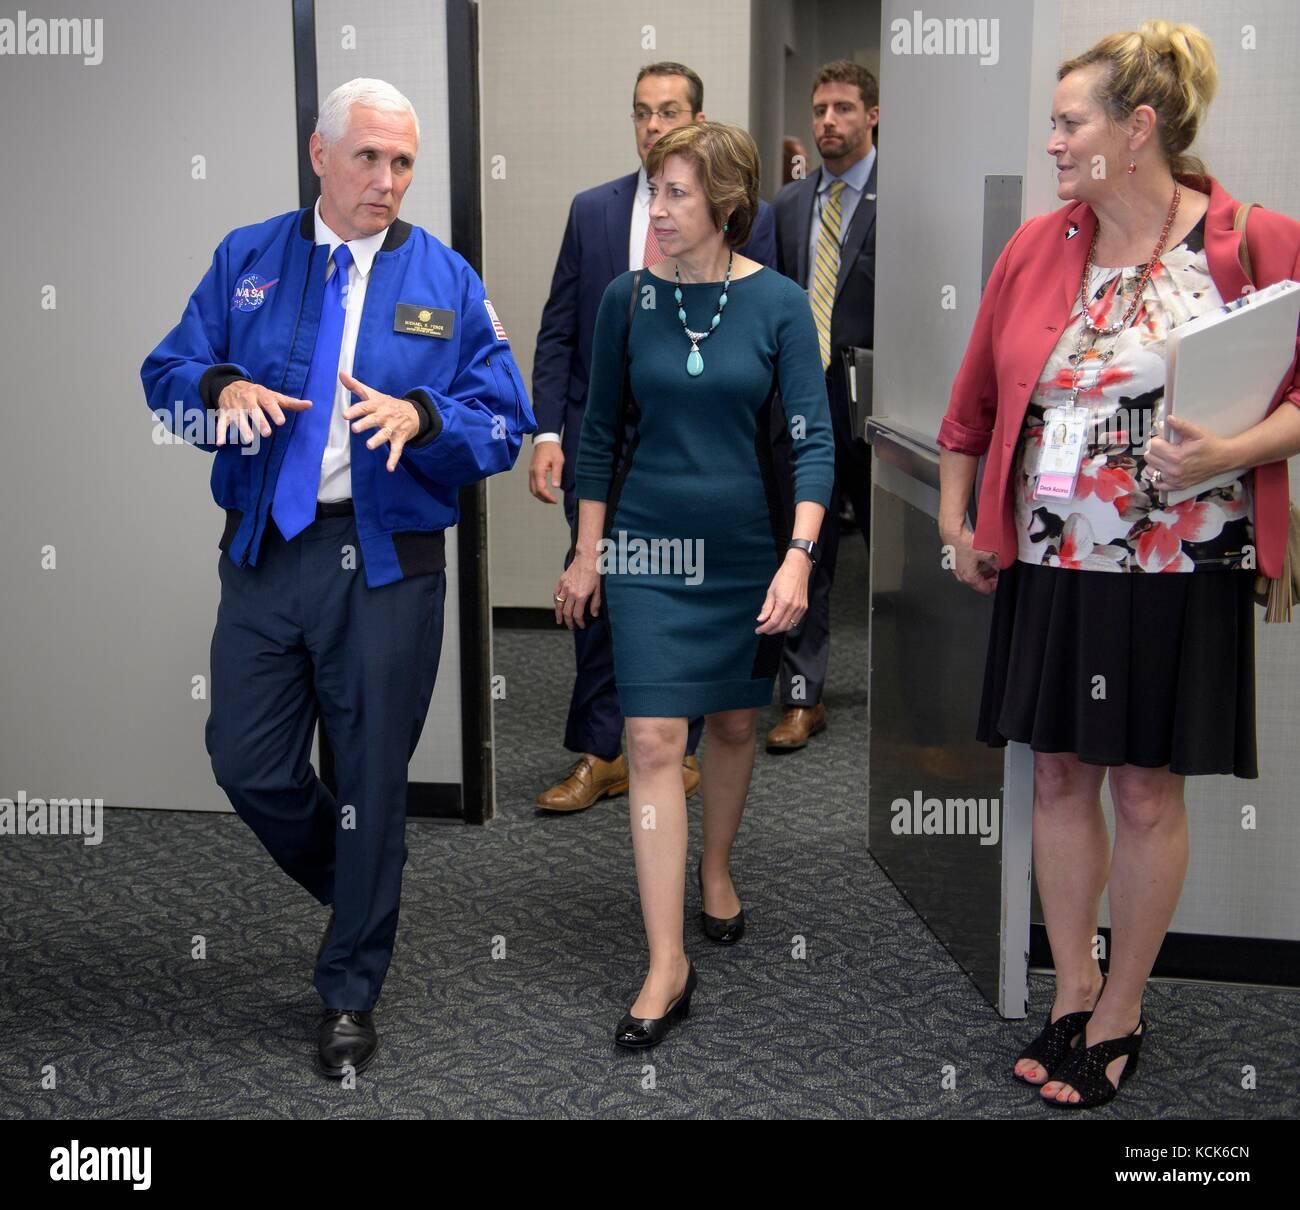 NASA Johnson Space Center Director Ellen Ochoa (right) gives U.S. Vice President Mike Pence a tour of the Johnson - Stock Image